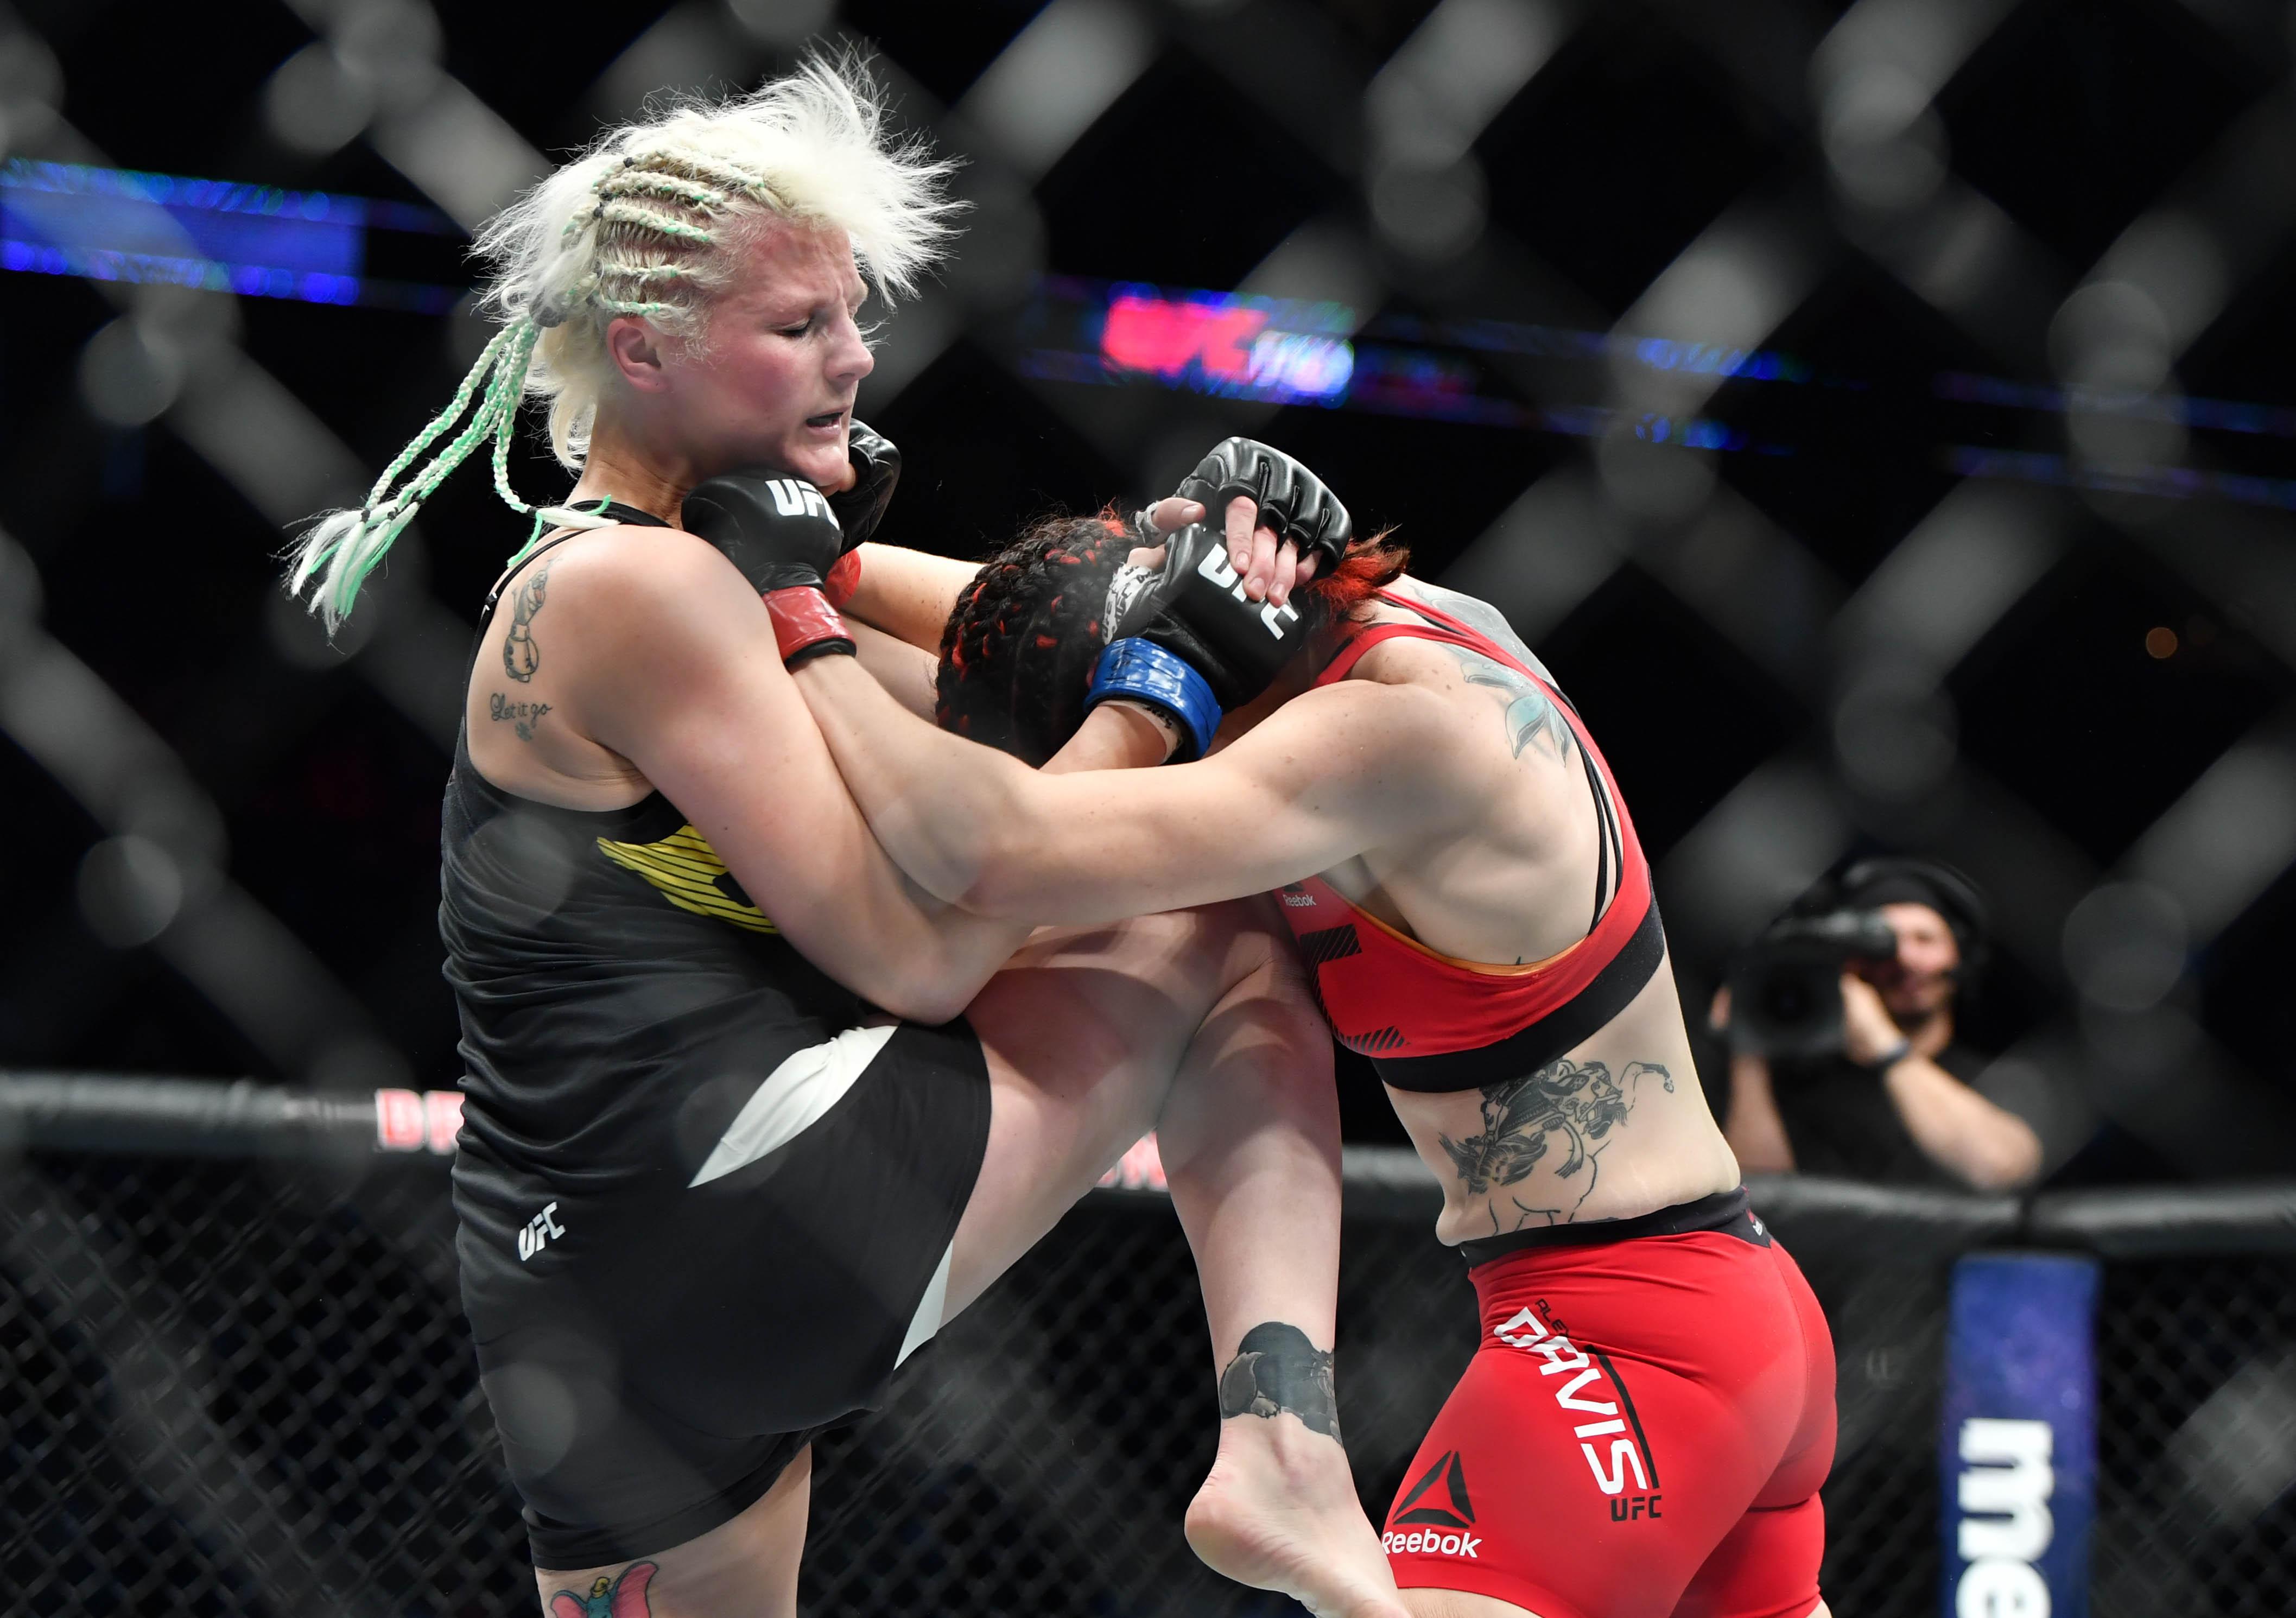 Mma fight cindy vs headgear guy 5